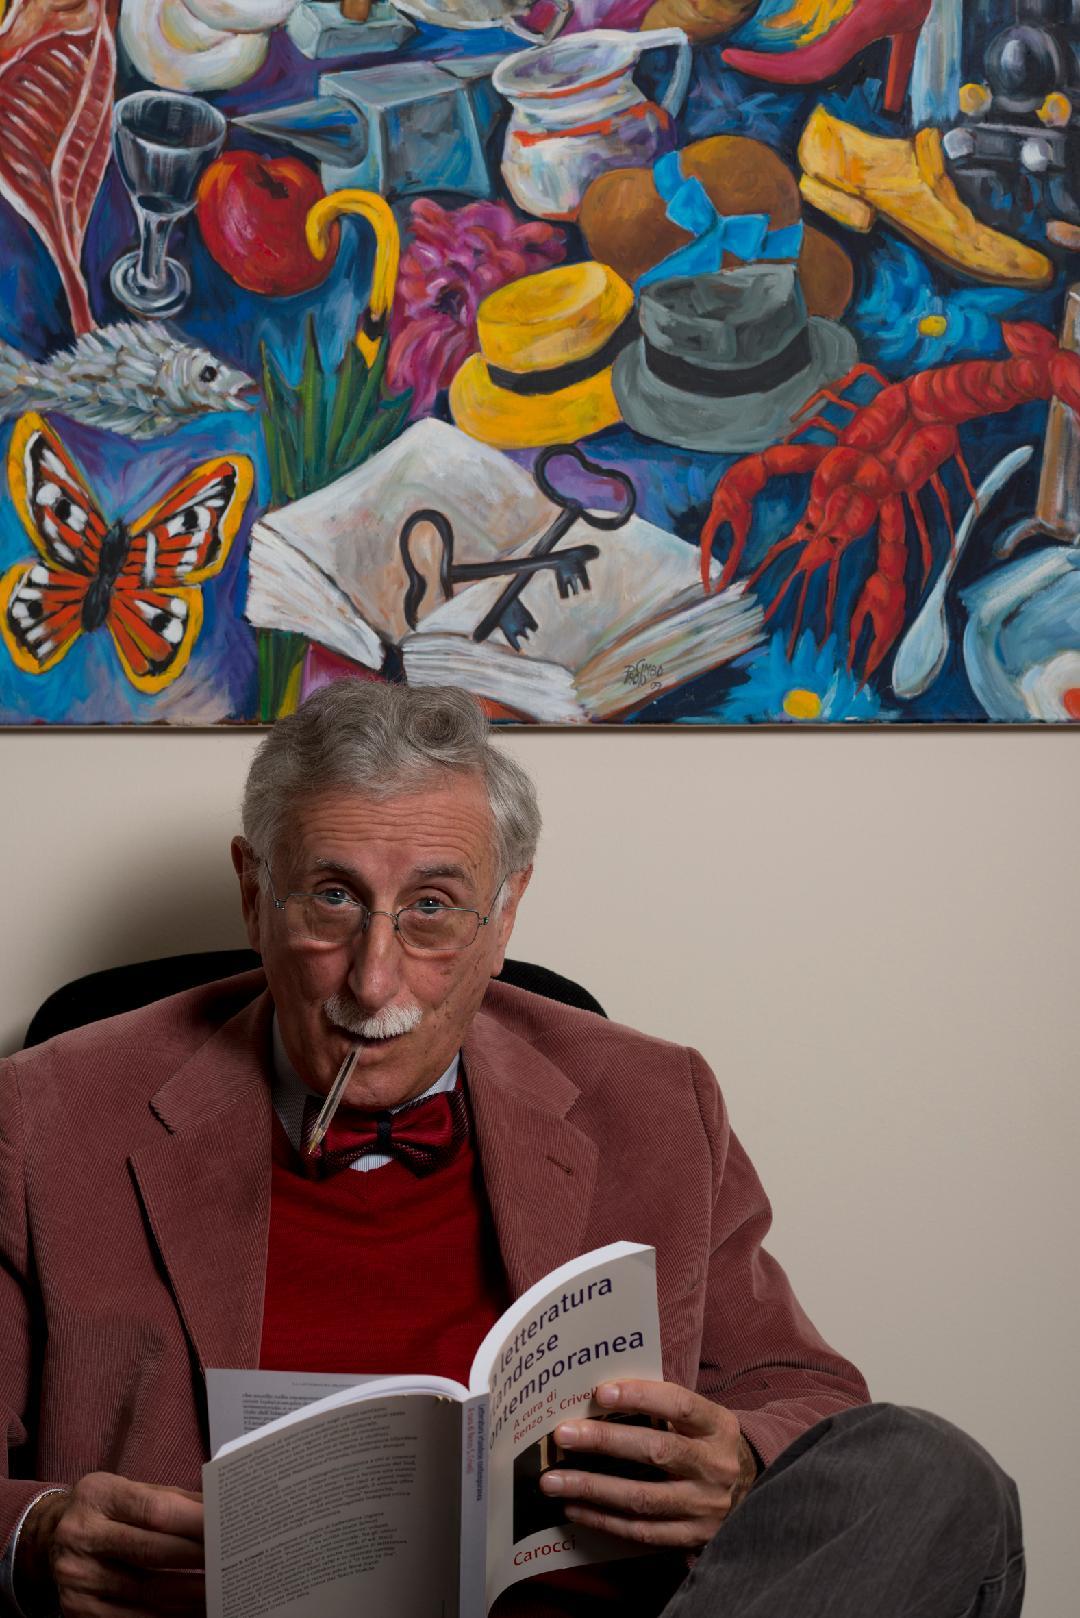 Renzo Crivell